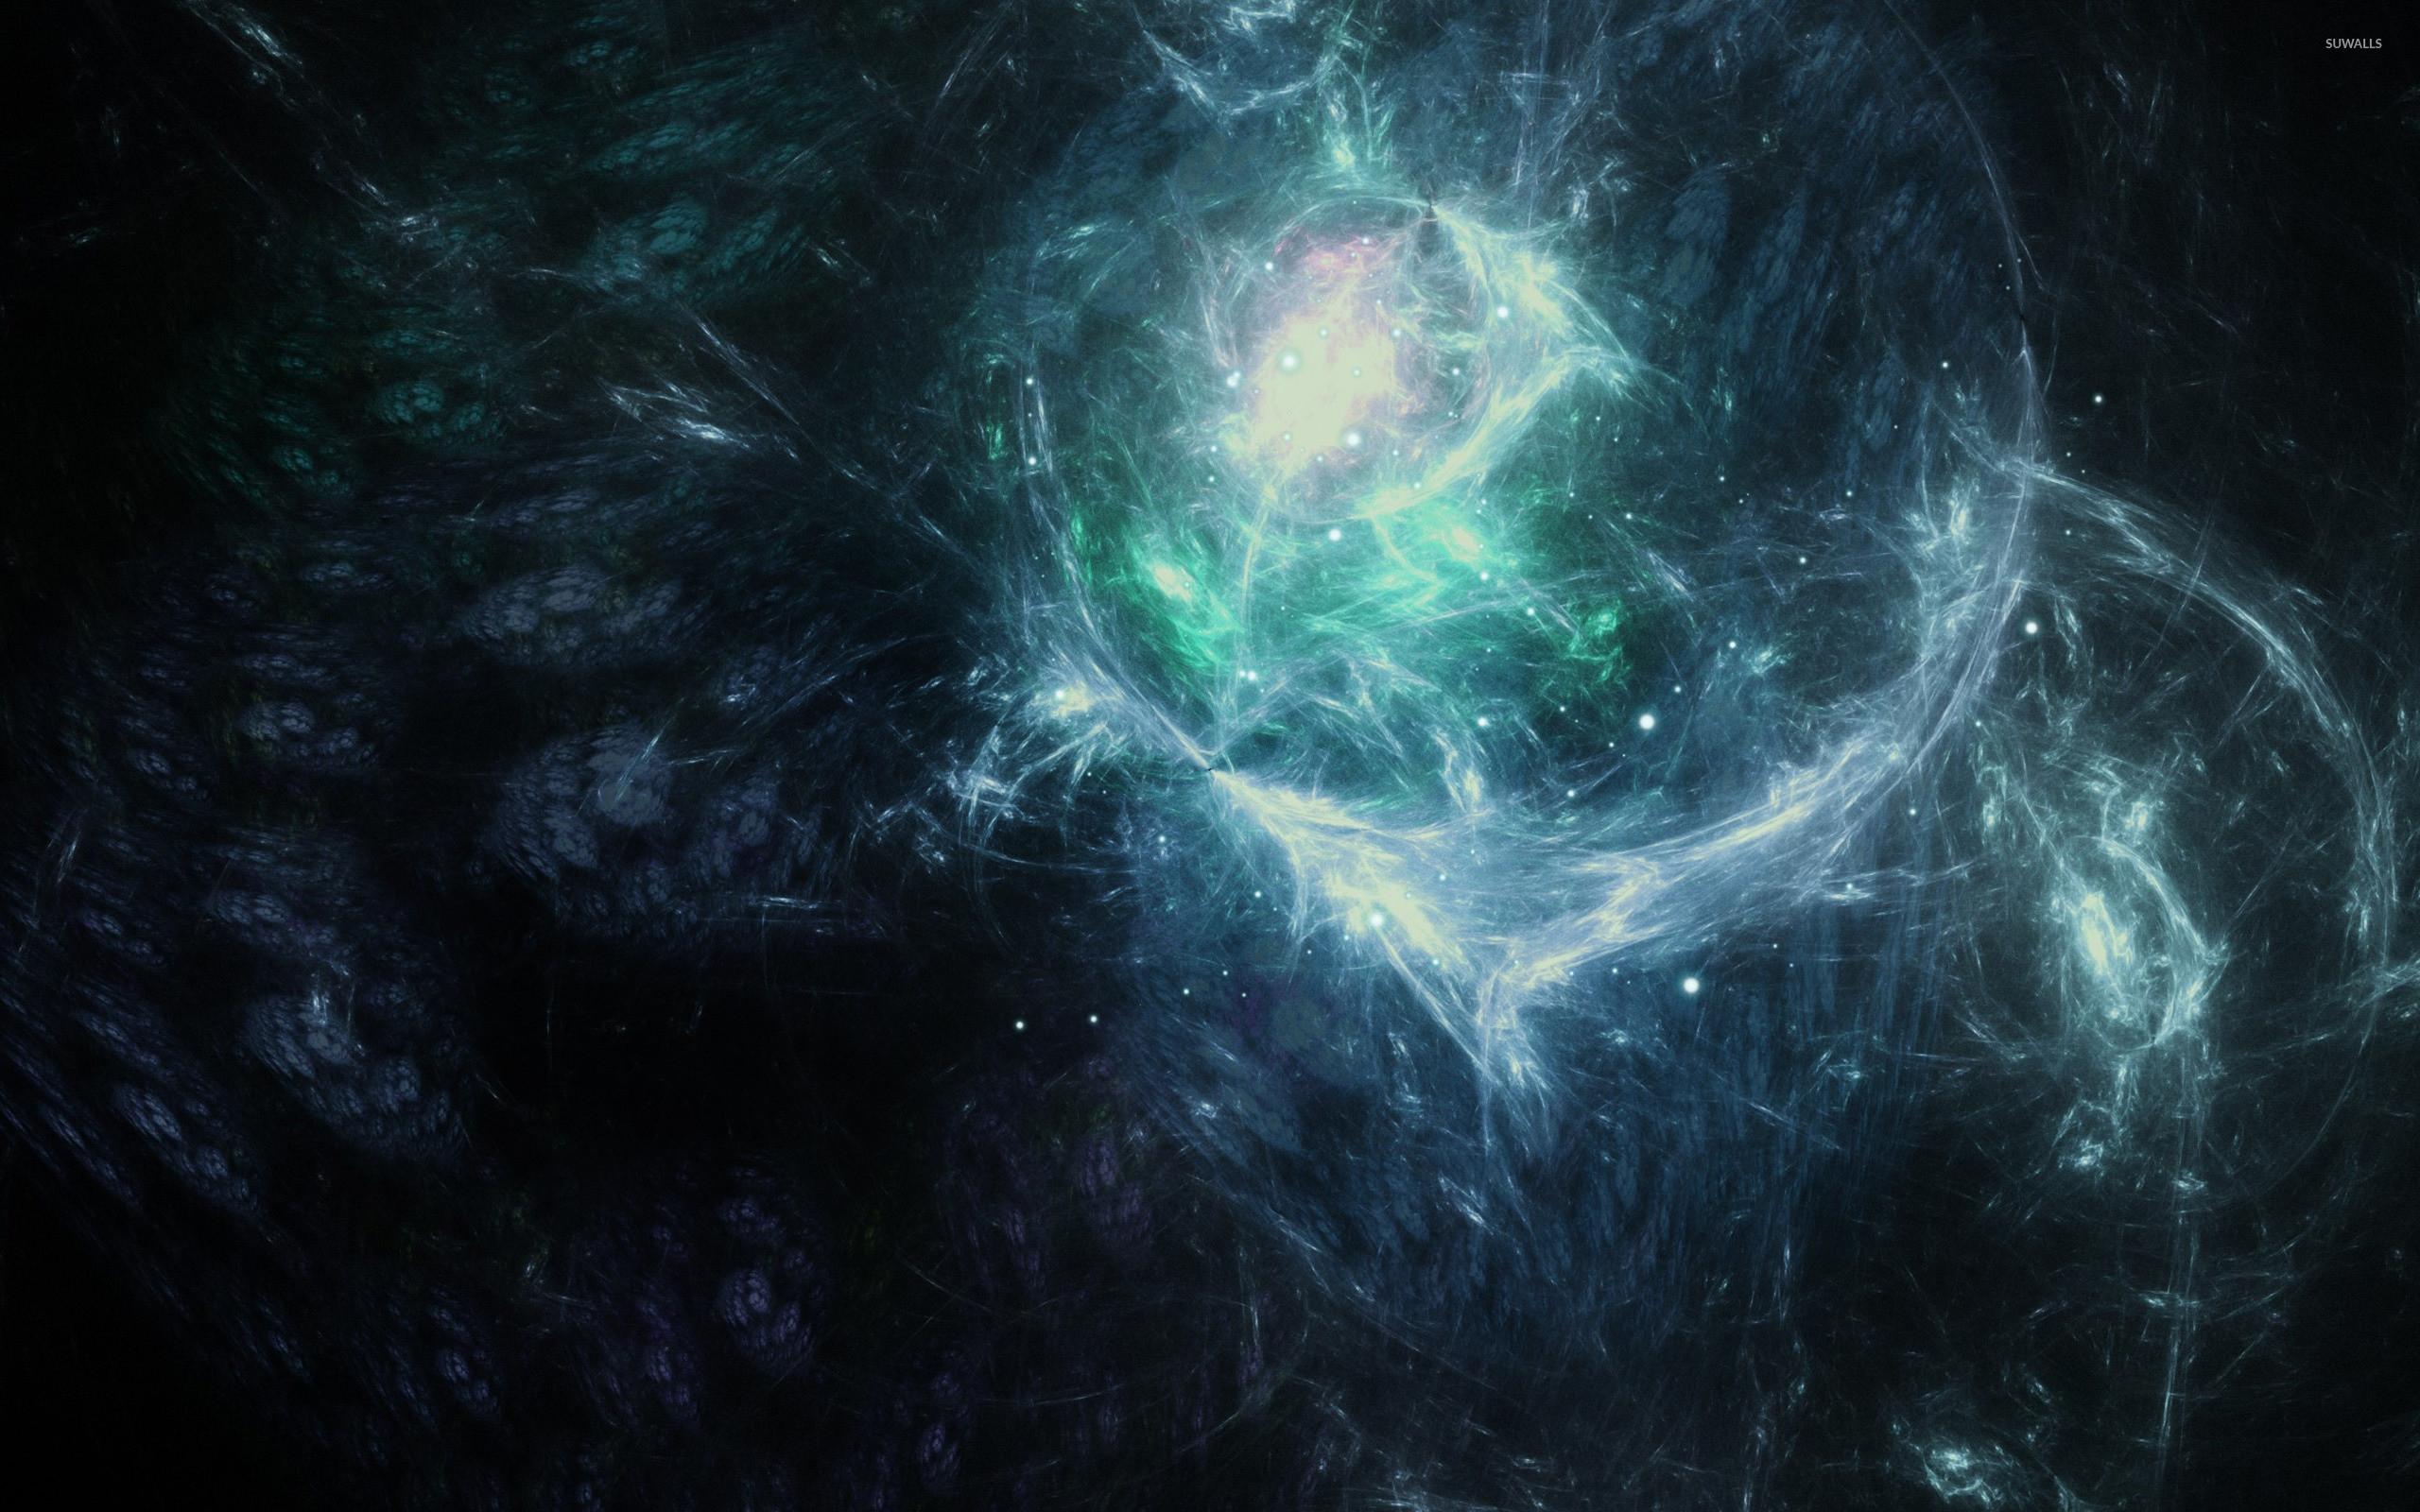 Space Demonic Art Hd Wallpaper: 2K Space Wallpapers (68+ Images